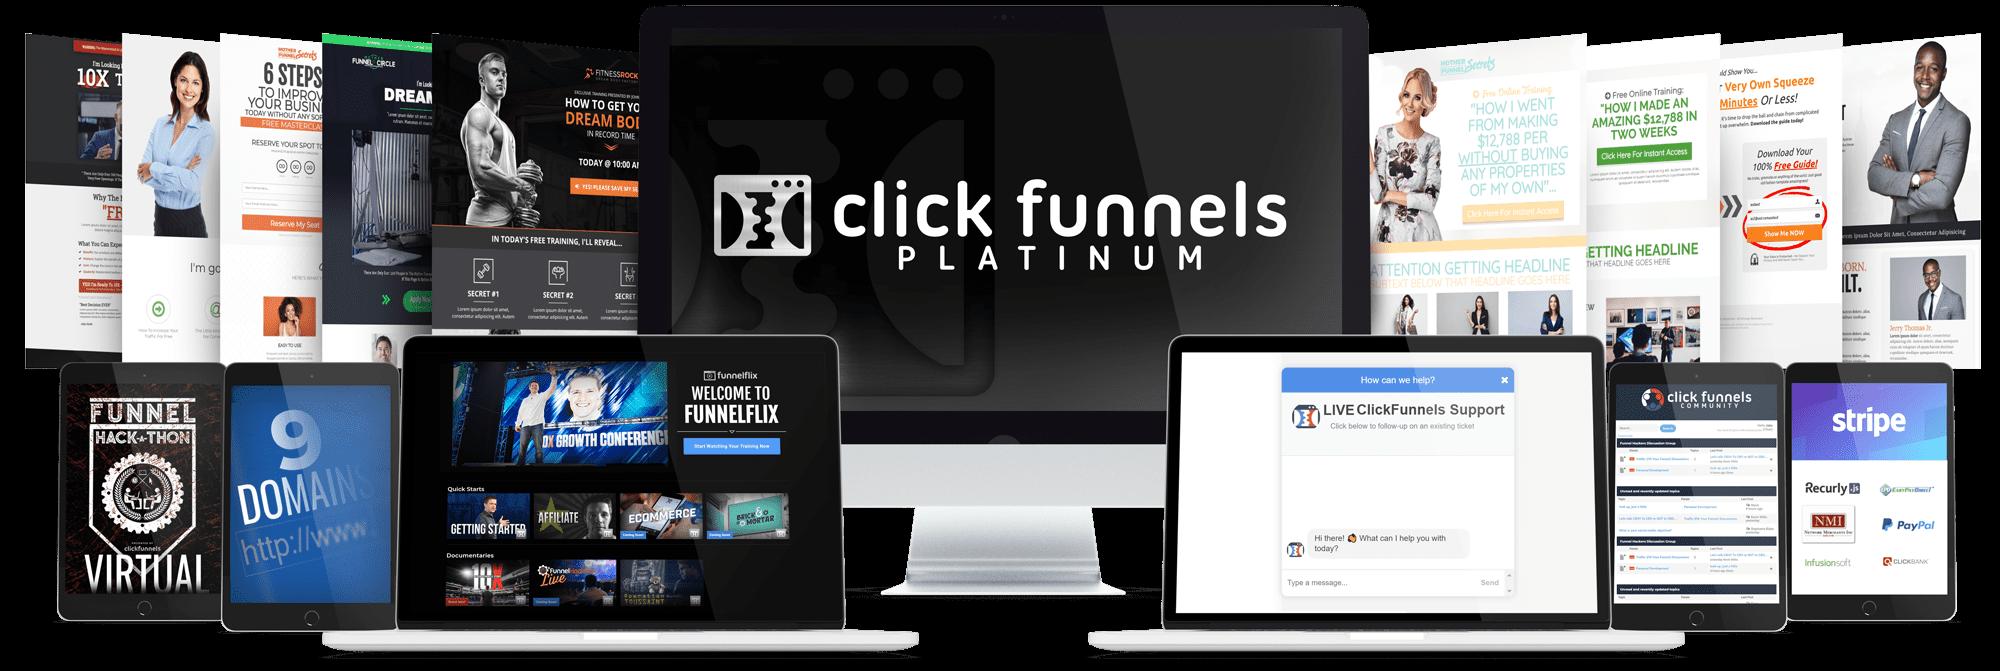 ClickFunnels Marketing Affiliation